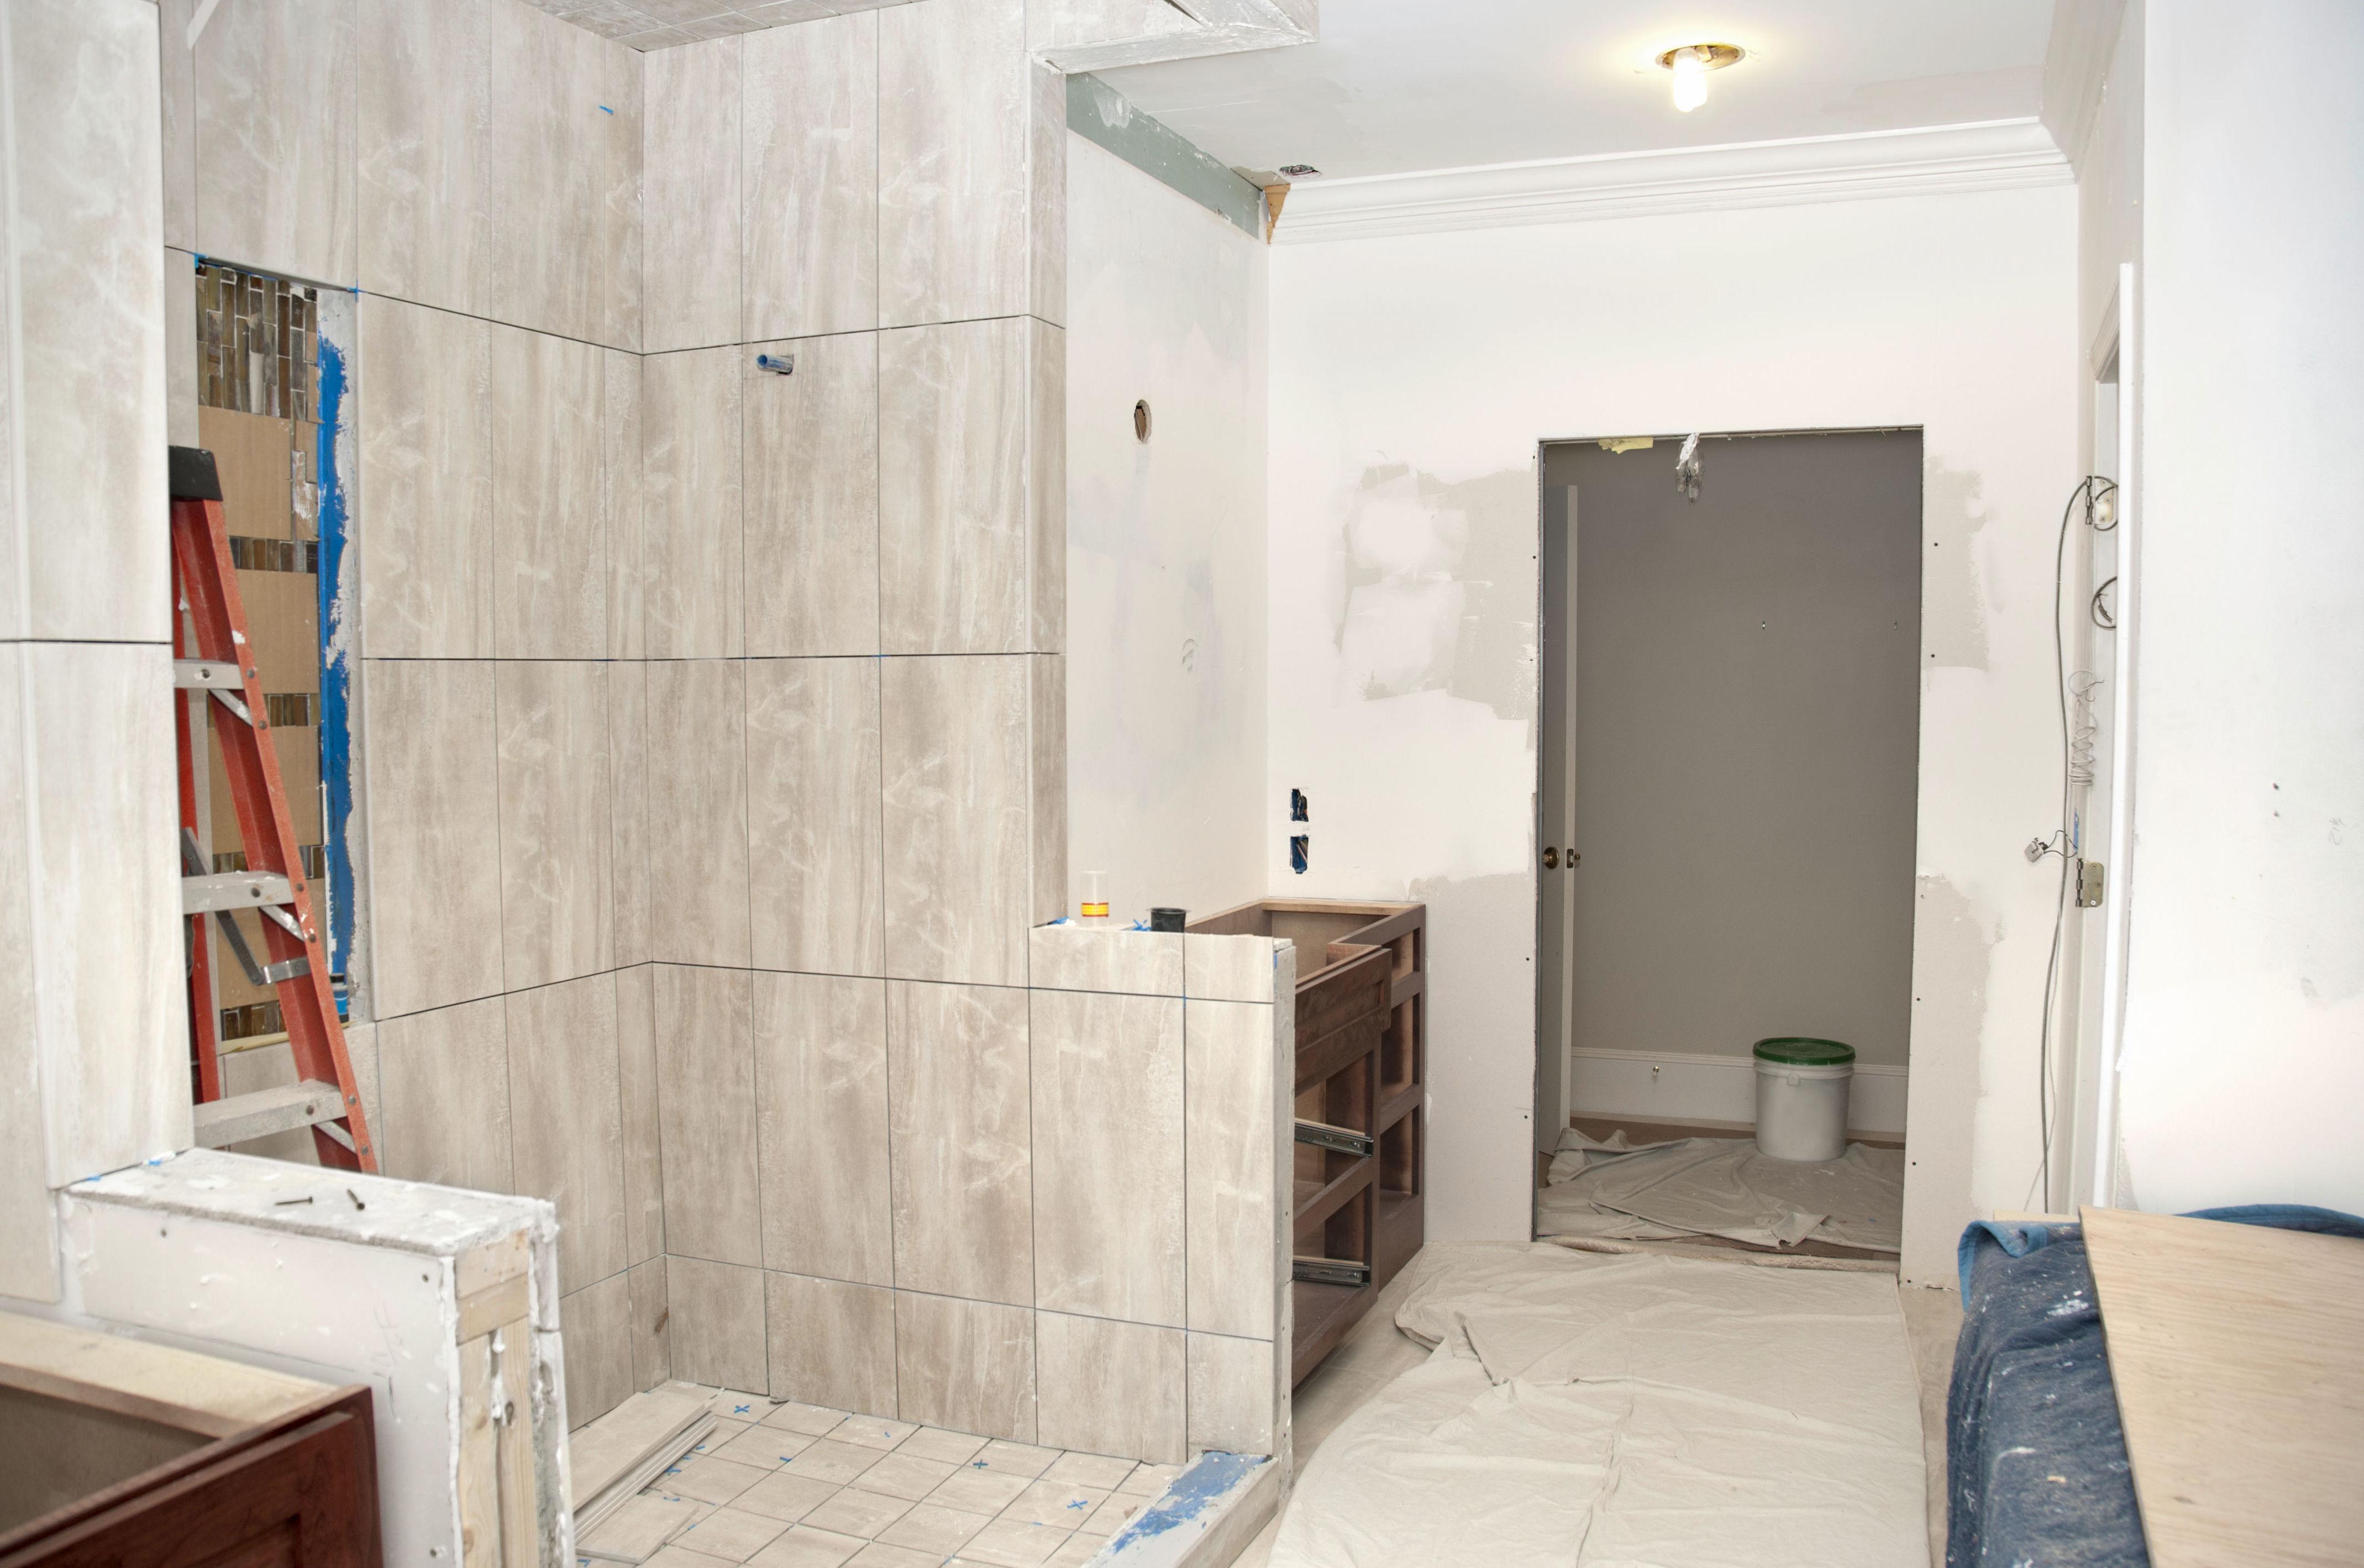 Reformas de viviendas en Donostia